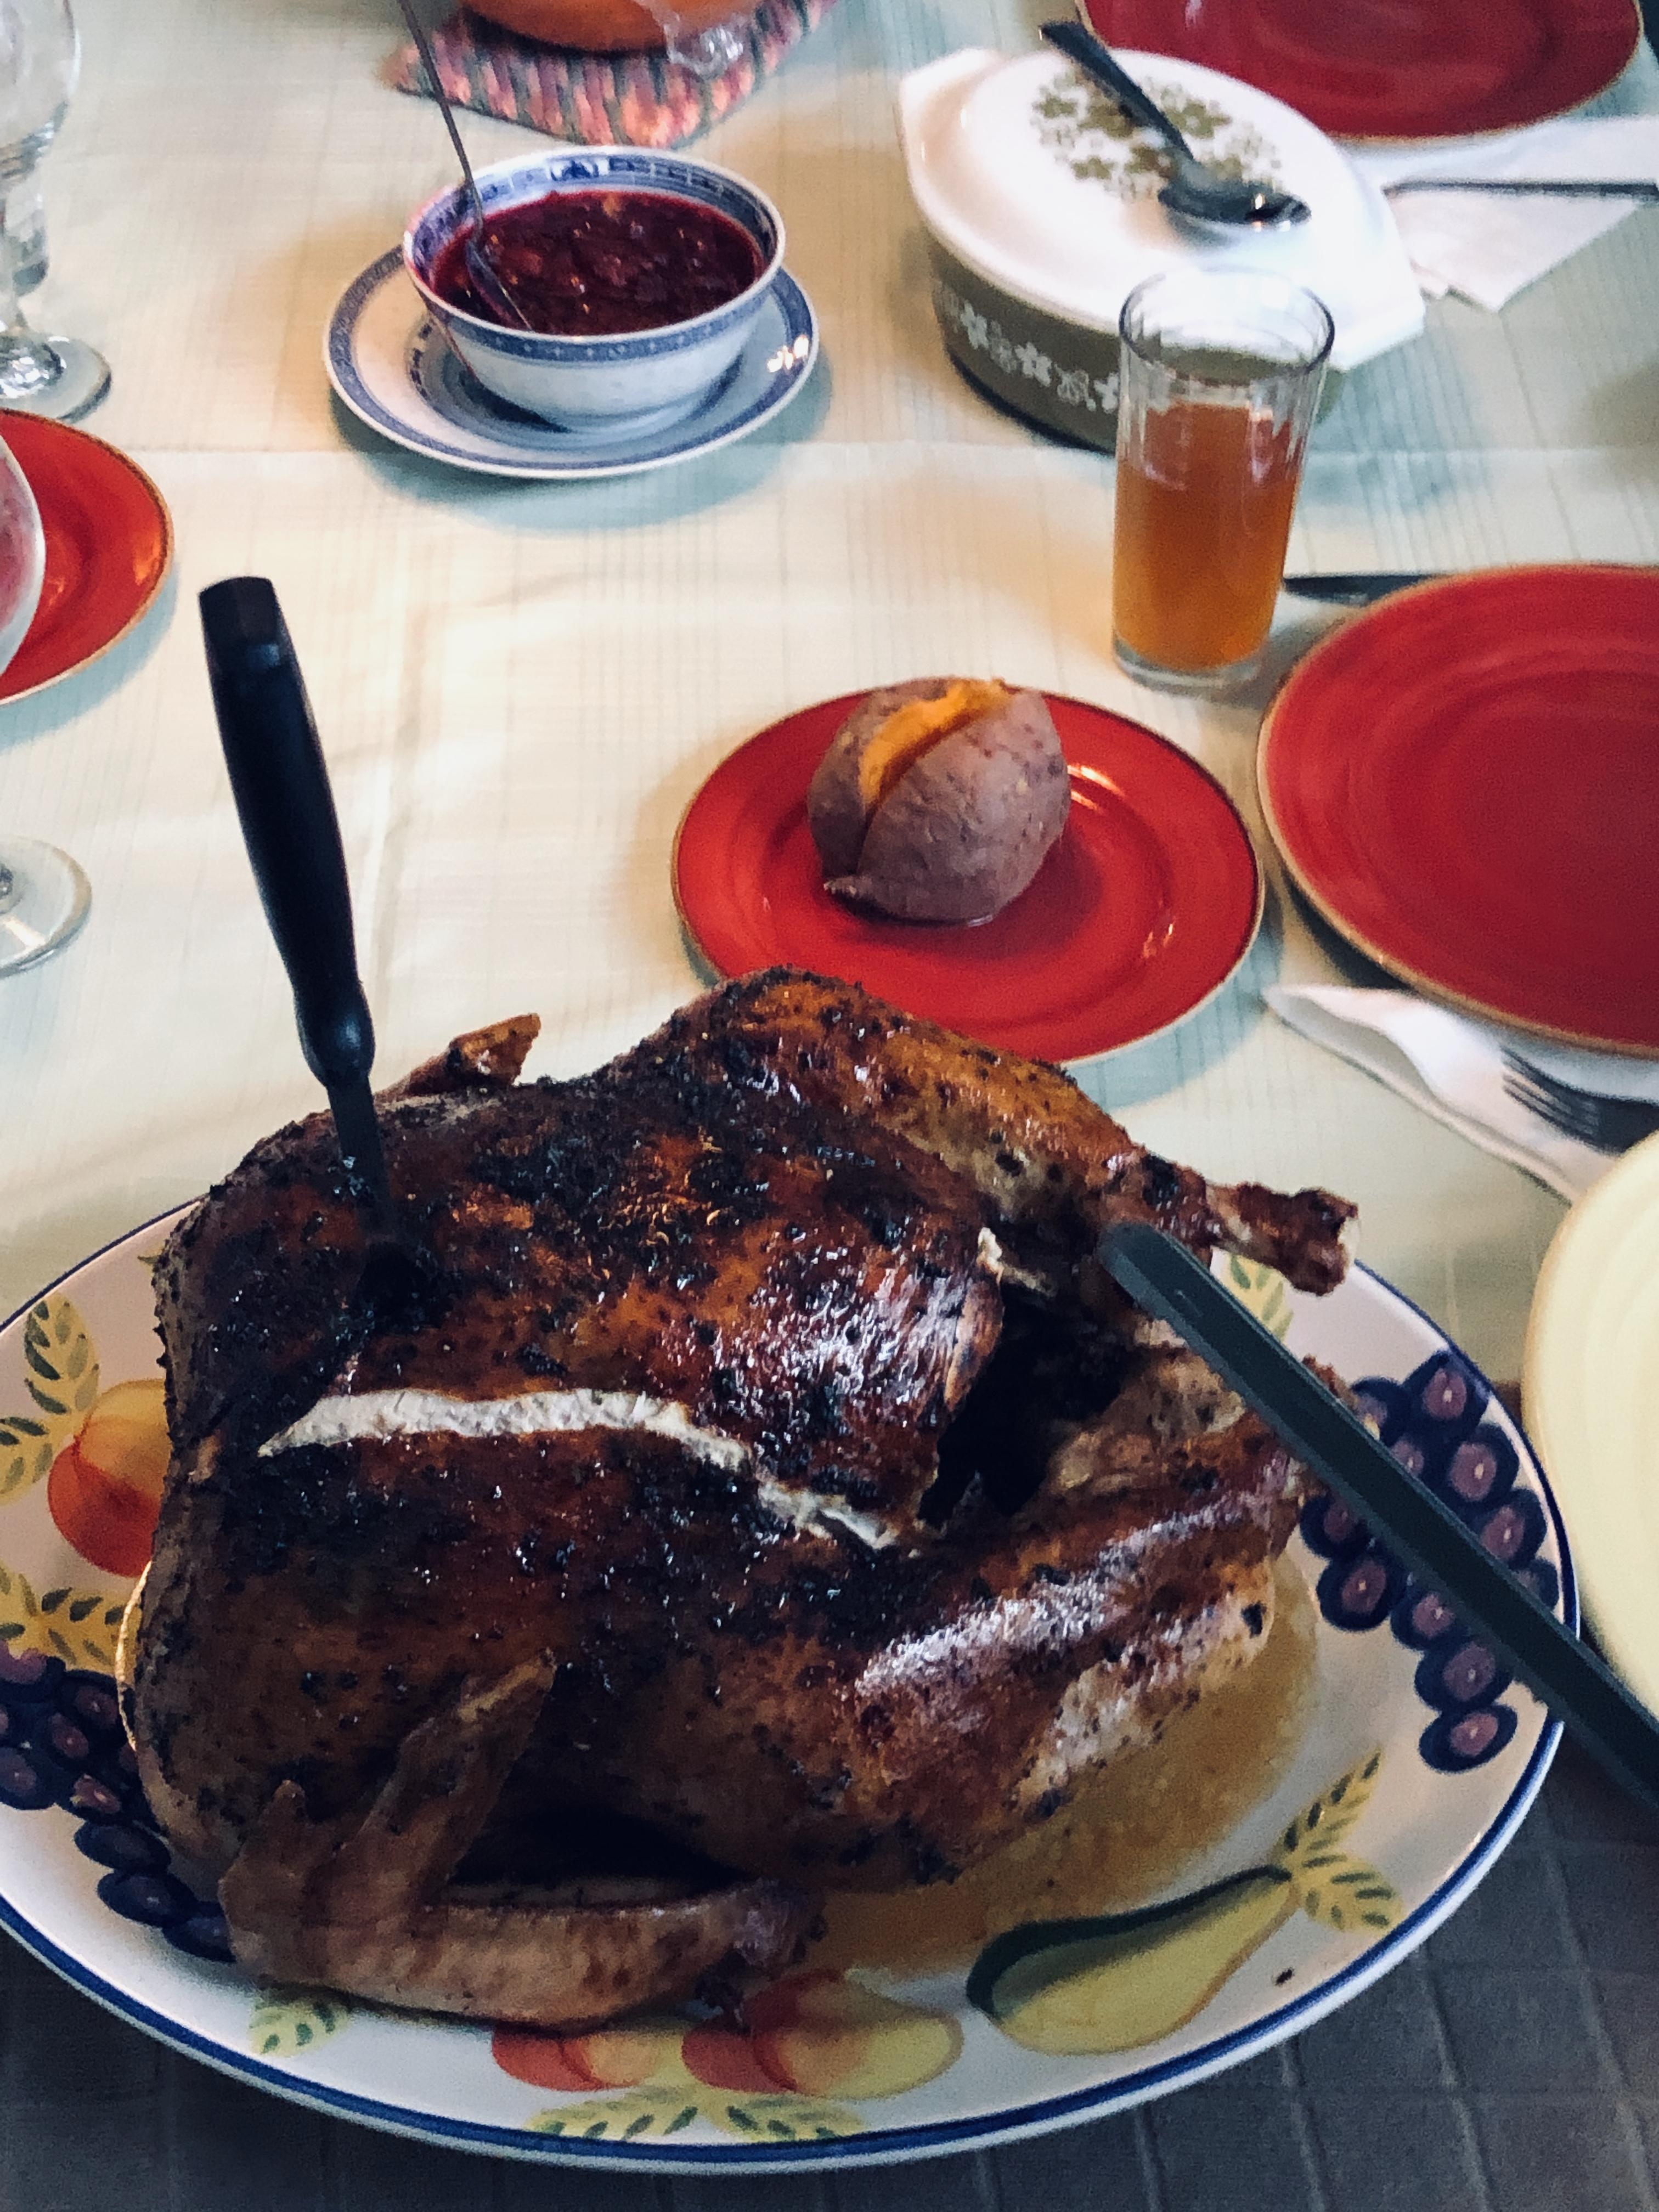 Herb-Glazed Roasted Turkey